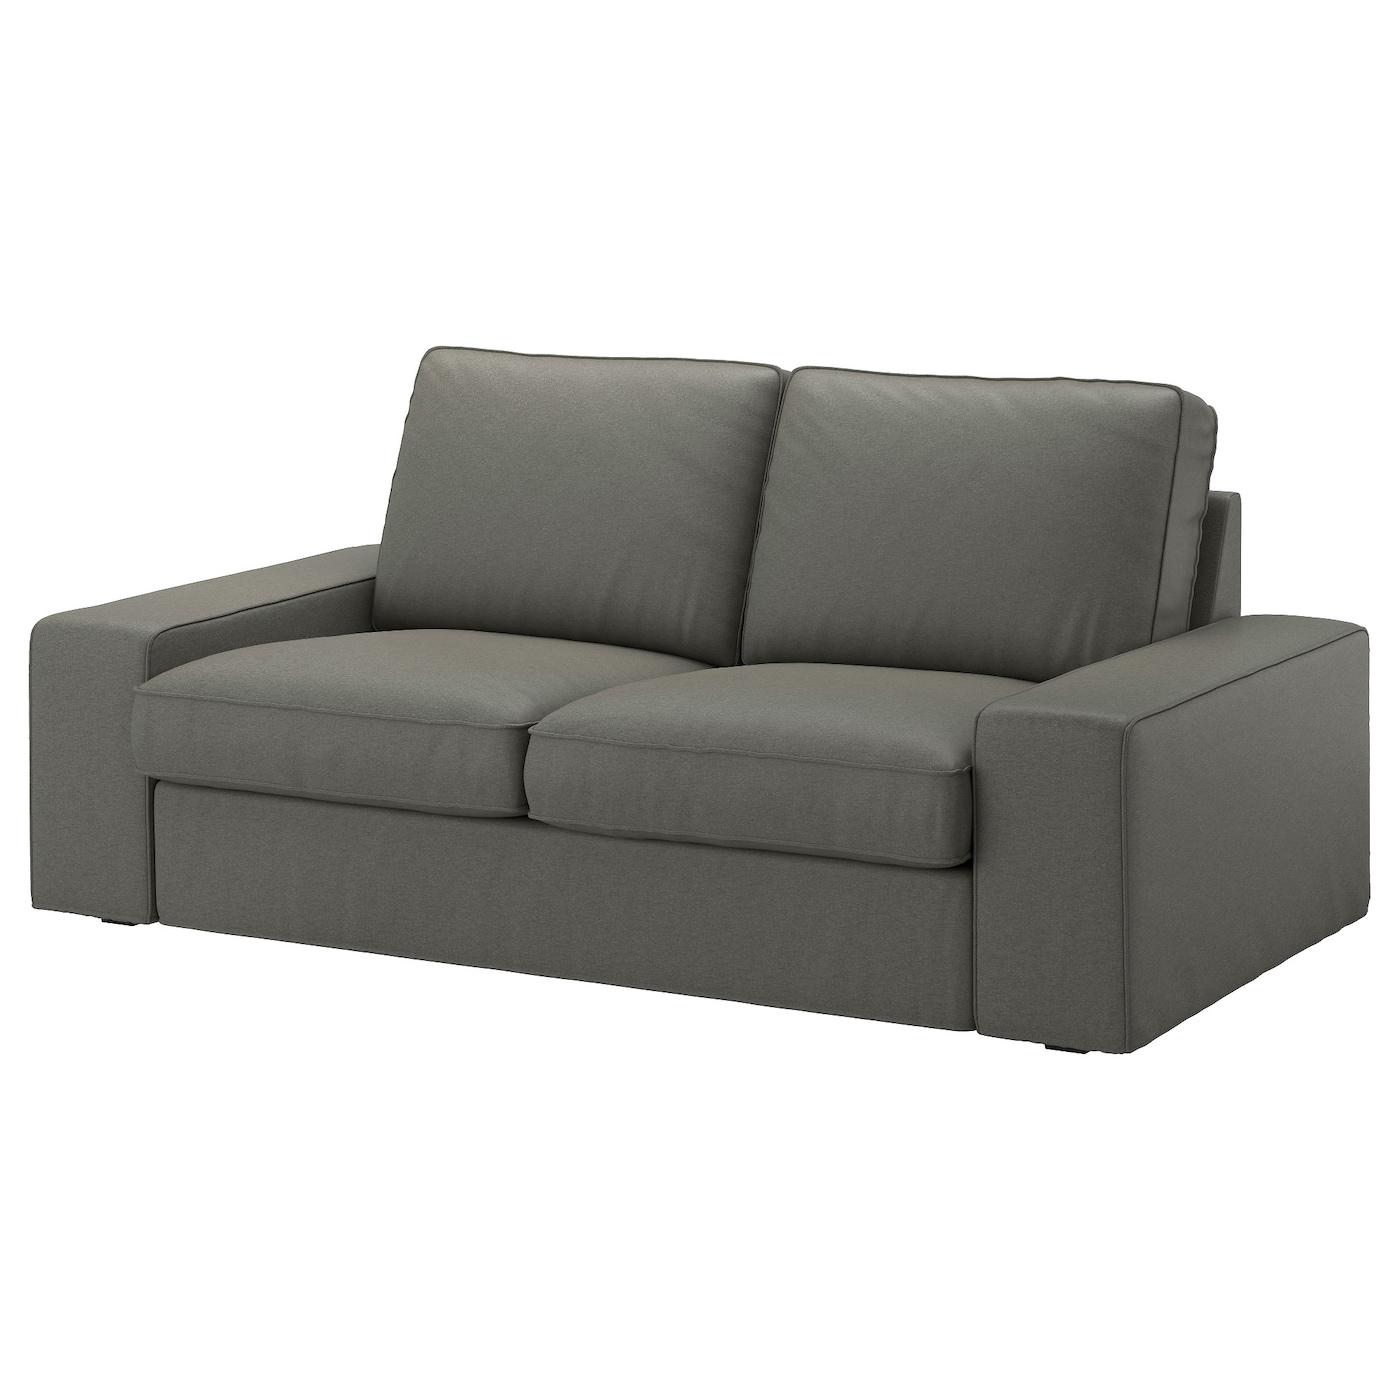 Cool Kivik Loveseat Borred Gray Green Evergreenethics Interior Chair Design Evergreenethicsorg